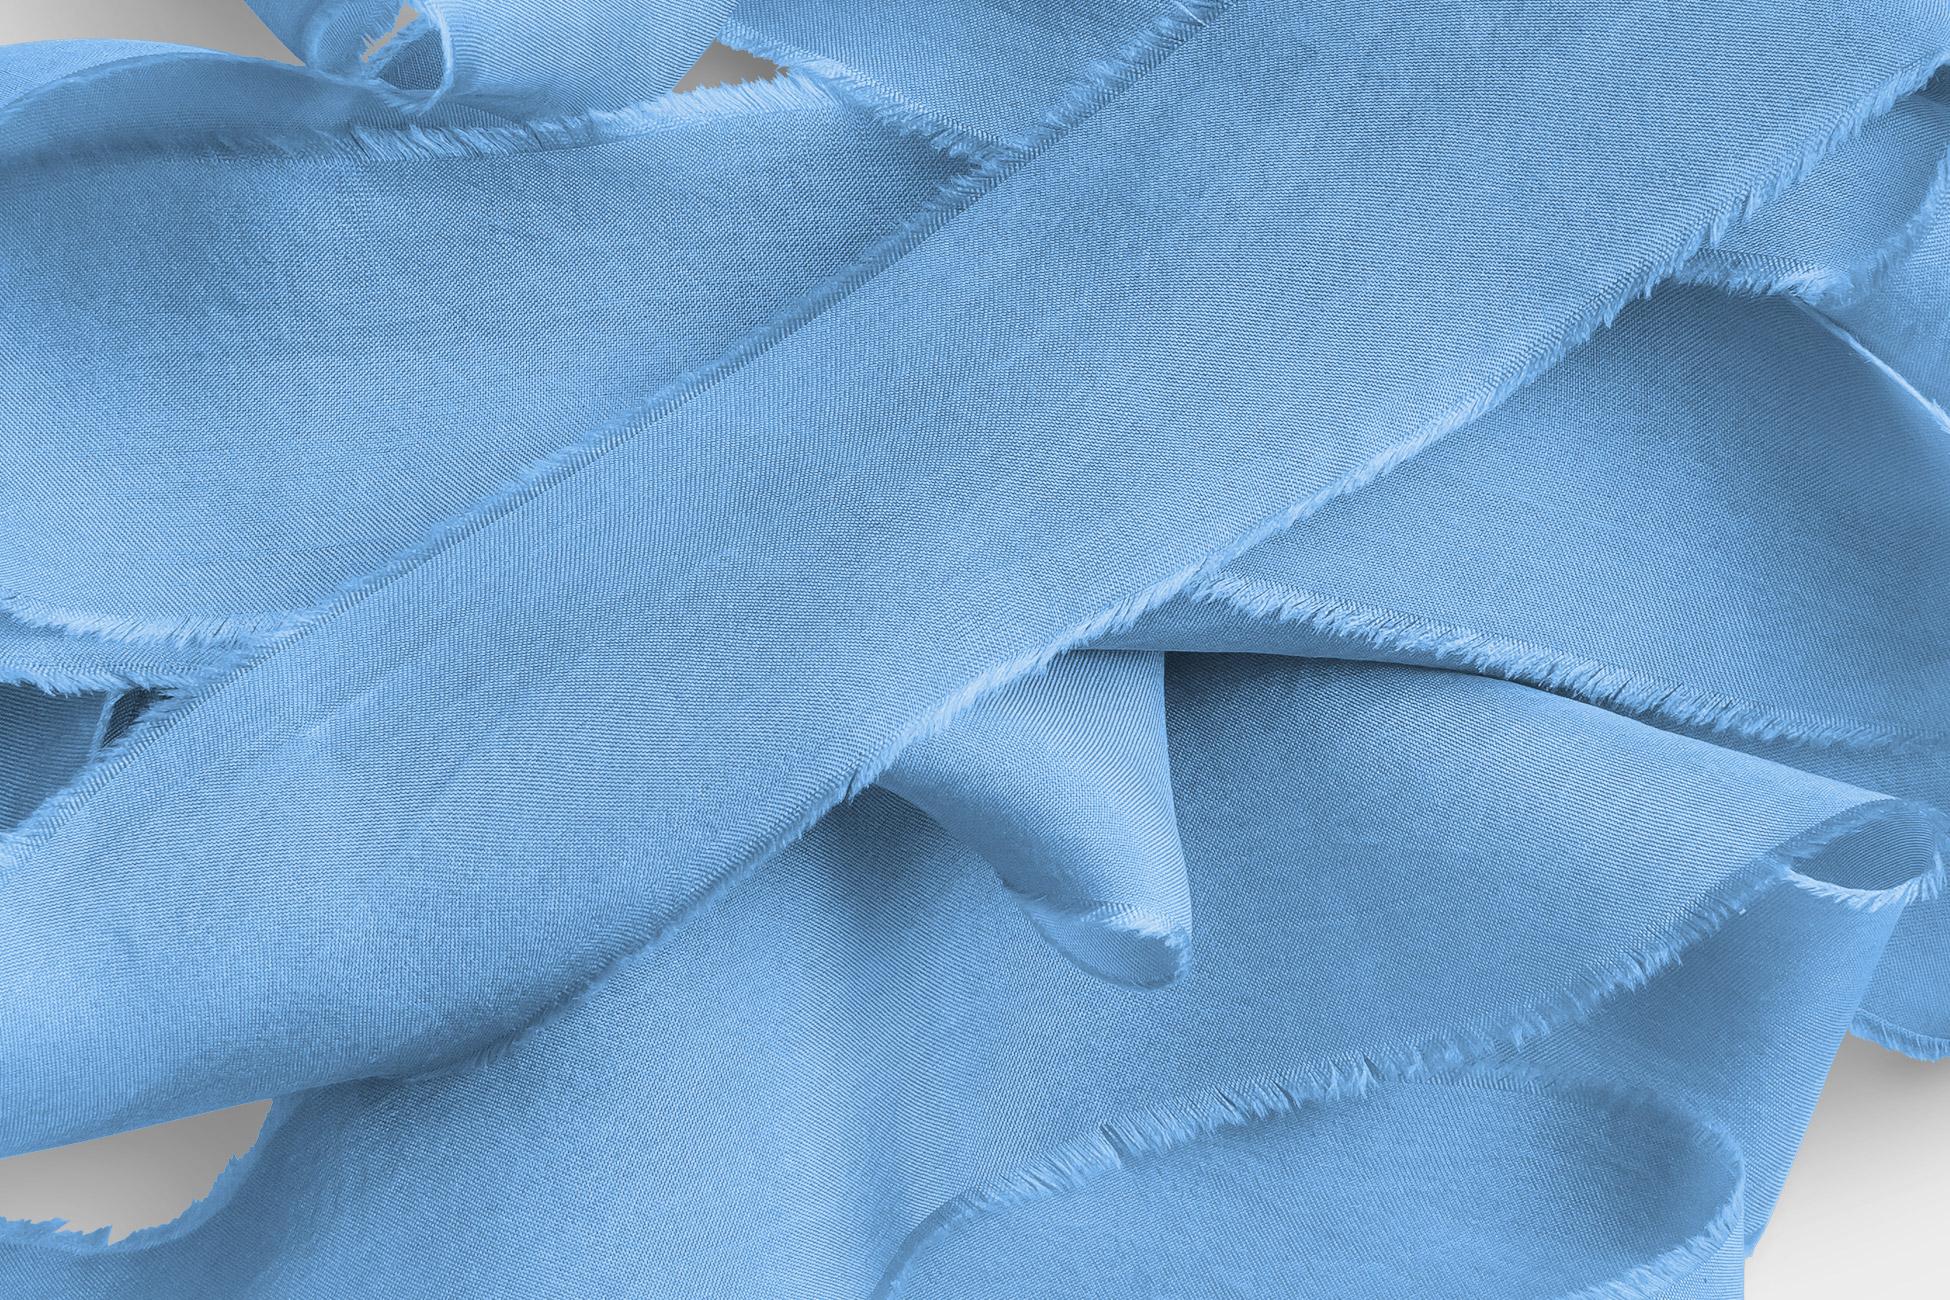 Silk Ribbons Volume 5 High Resolution